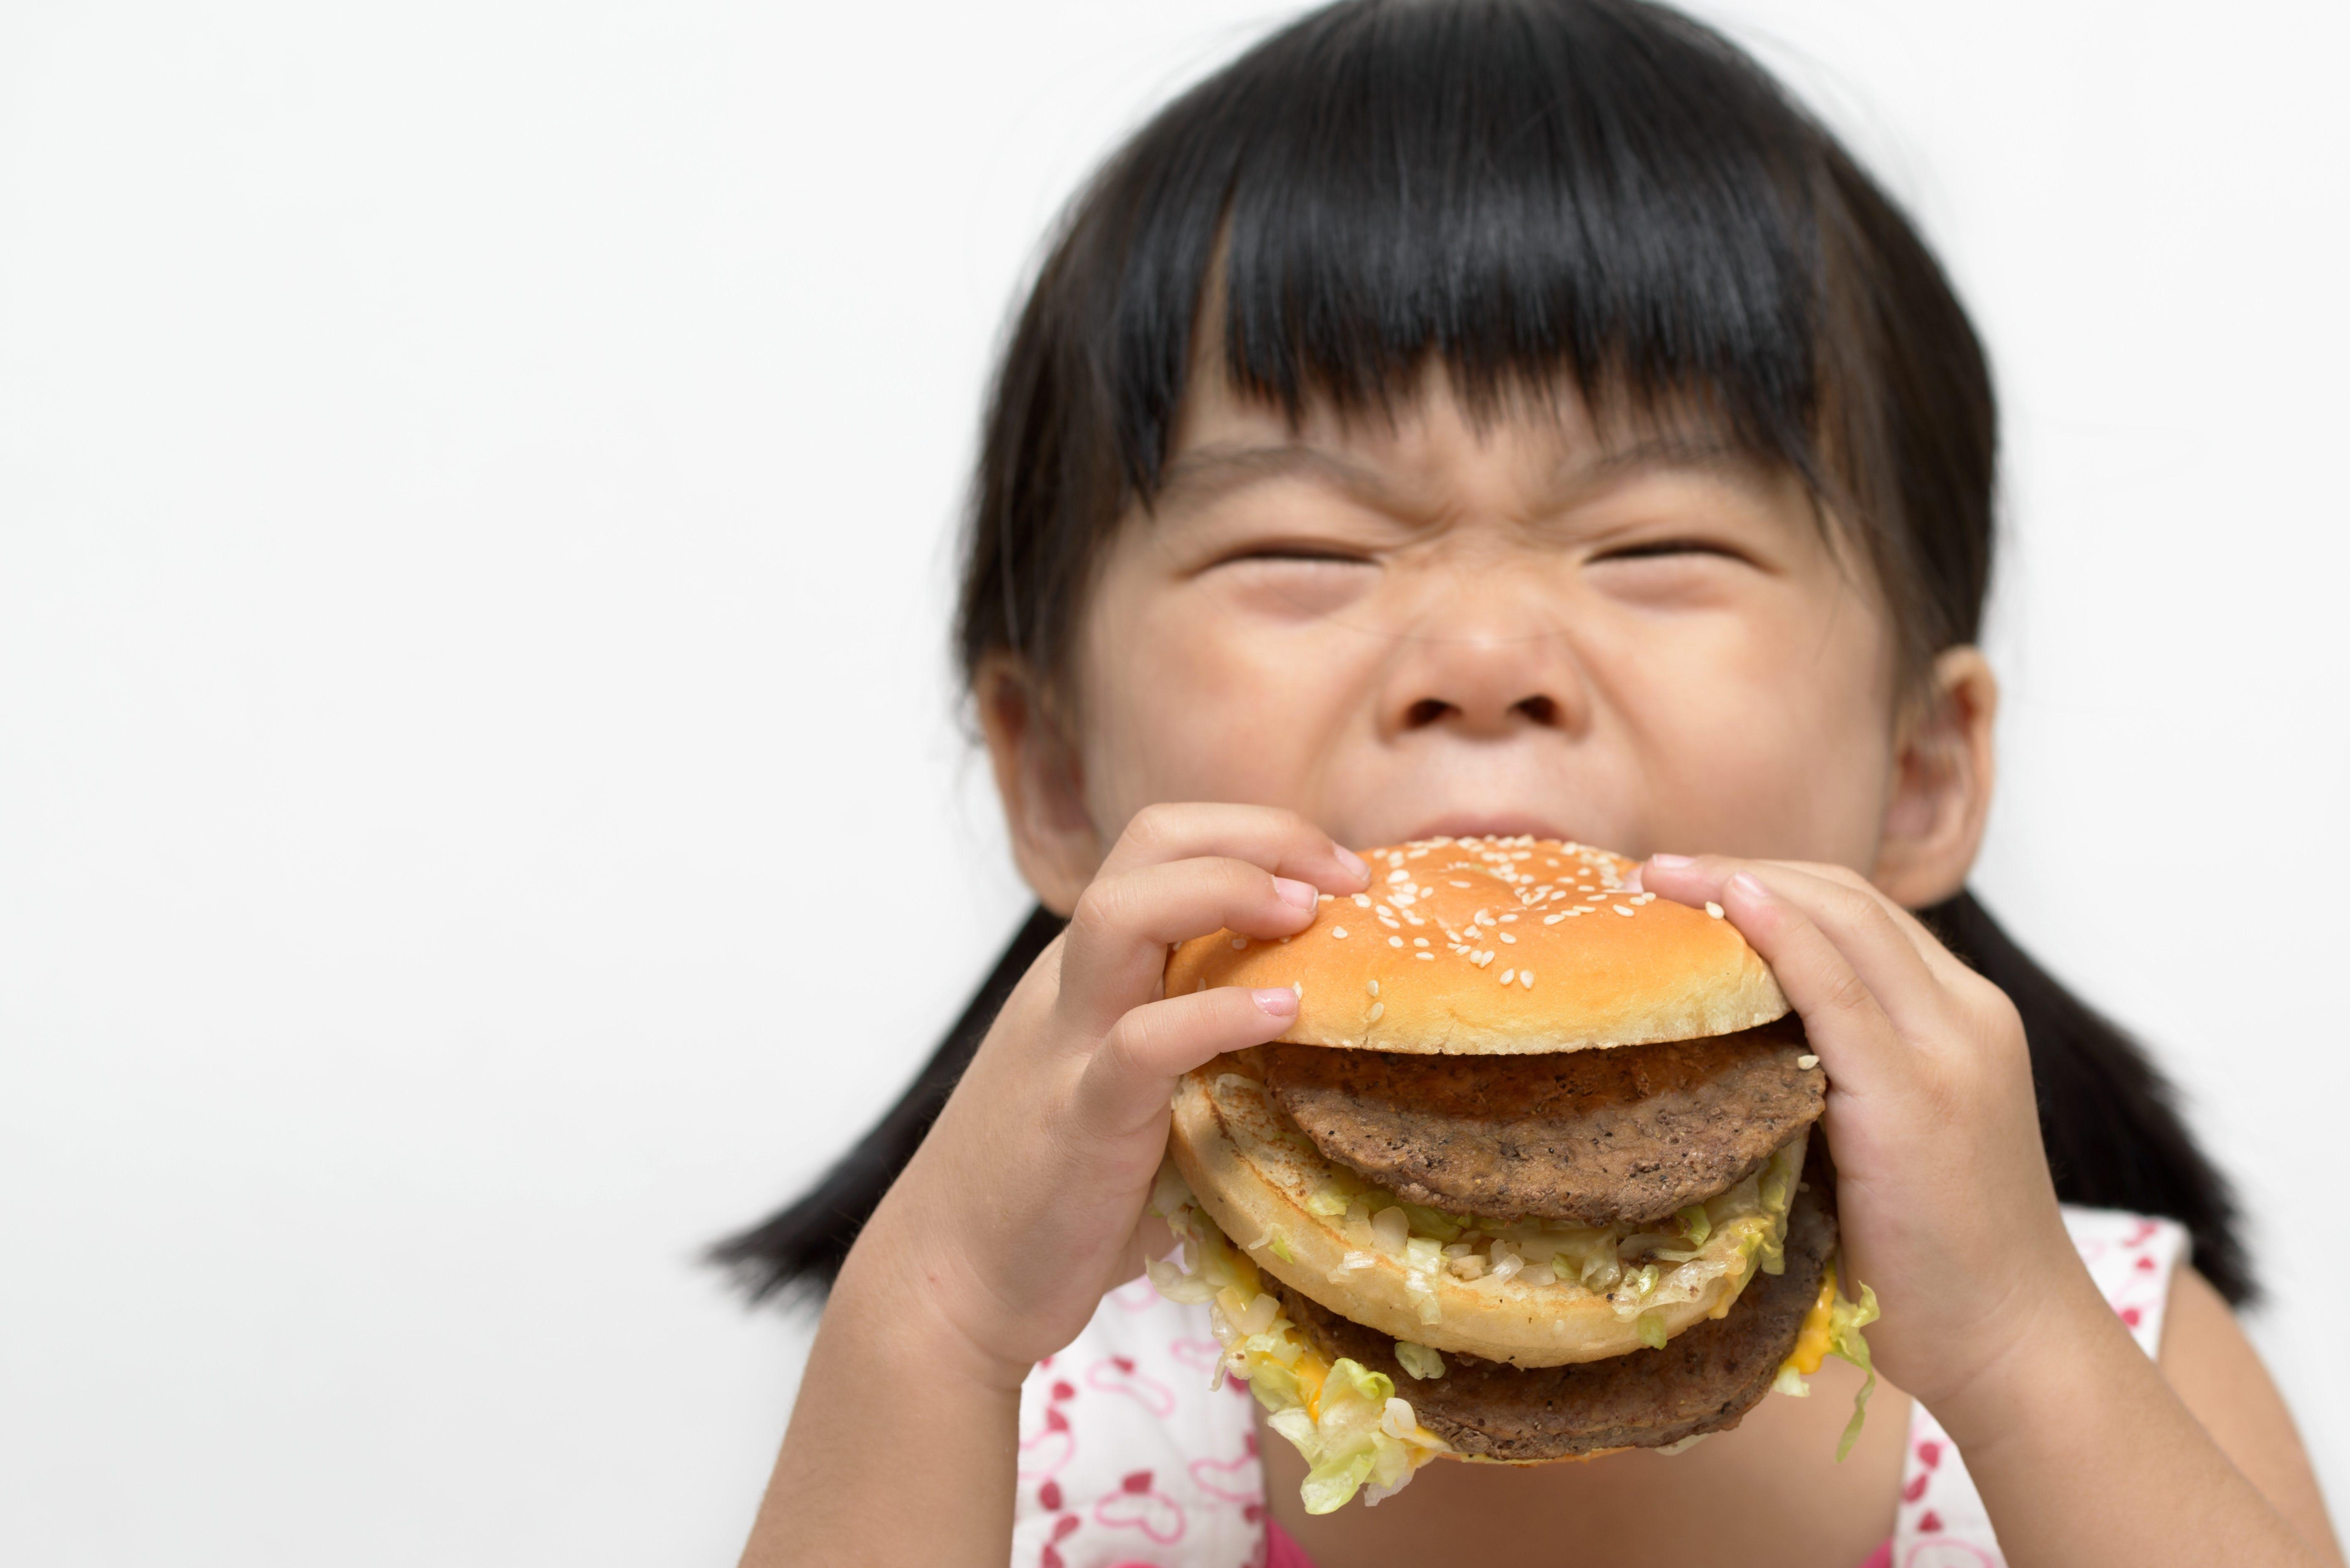 New Study: Sleep Loss Causes Kids to Eat More